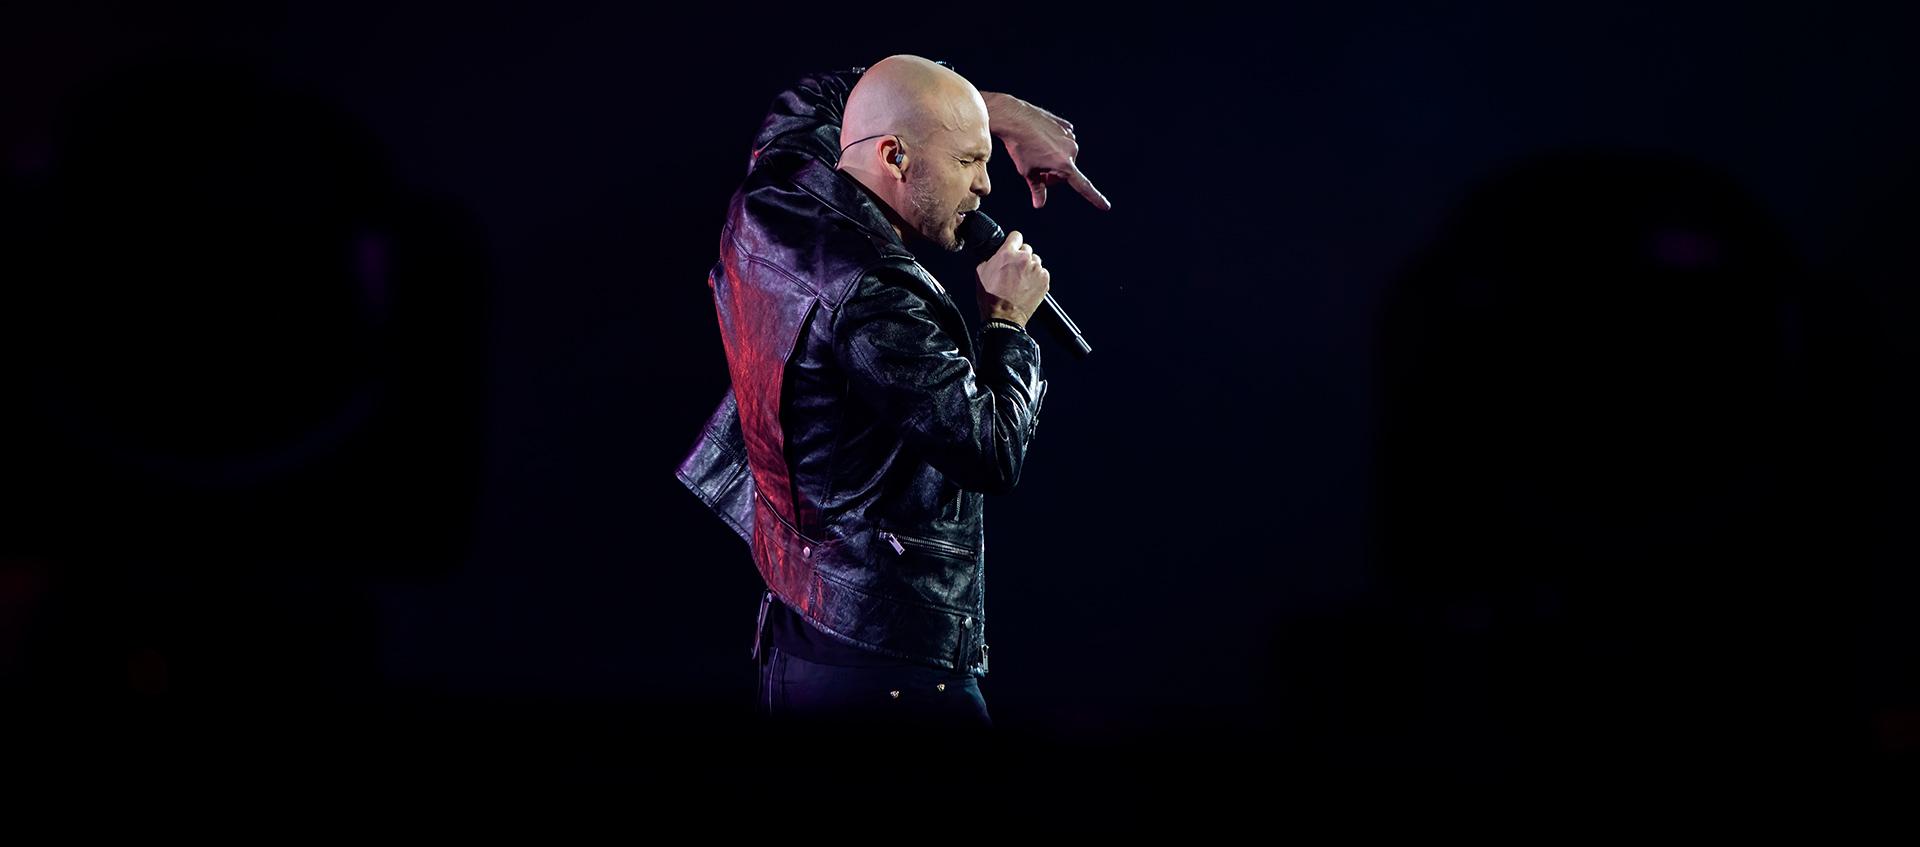 Juha Tapio, Hartwall Arena, show, pop singer, concert, gig